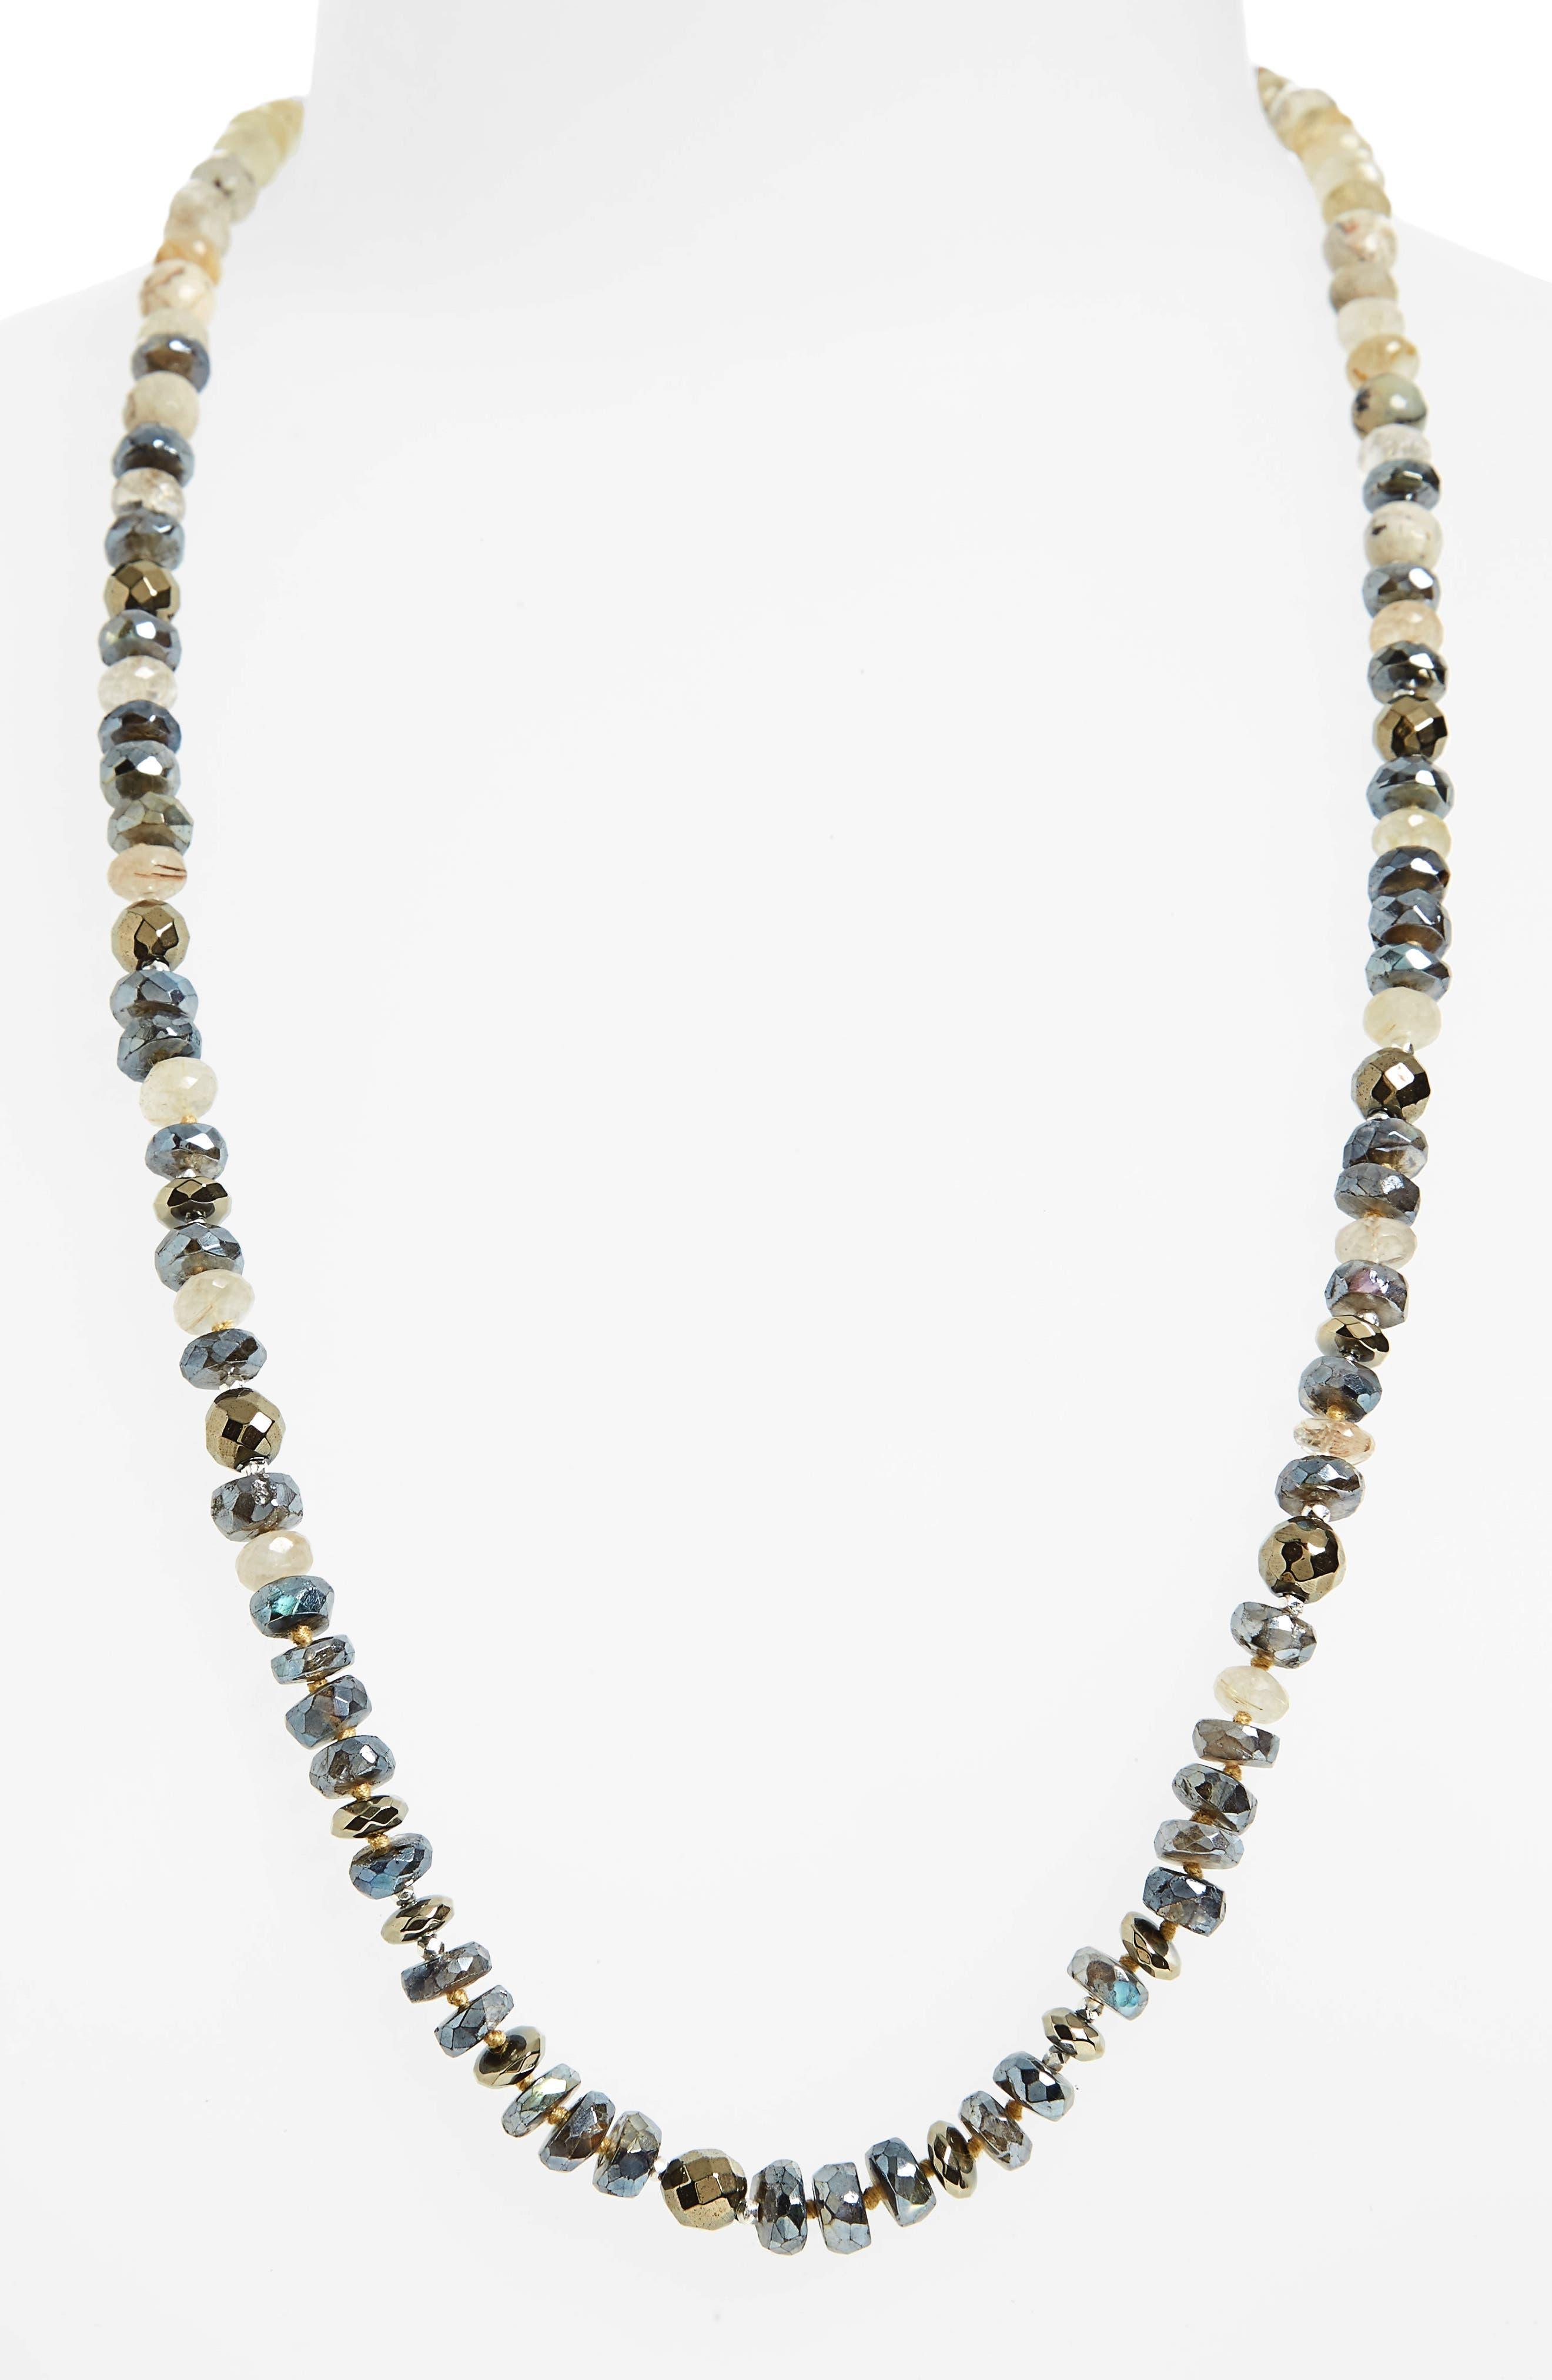 Semiprecious Stone Adjustable Necklace,                             Main thumbnail 1, color,                             Pyrite